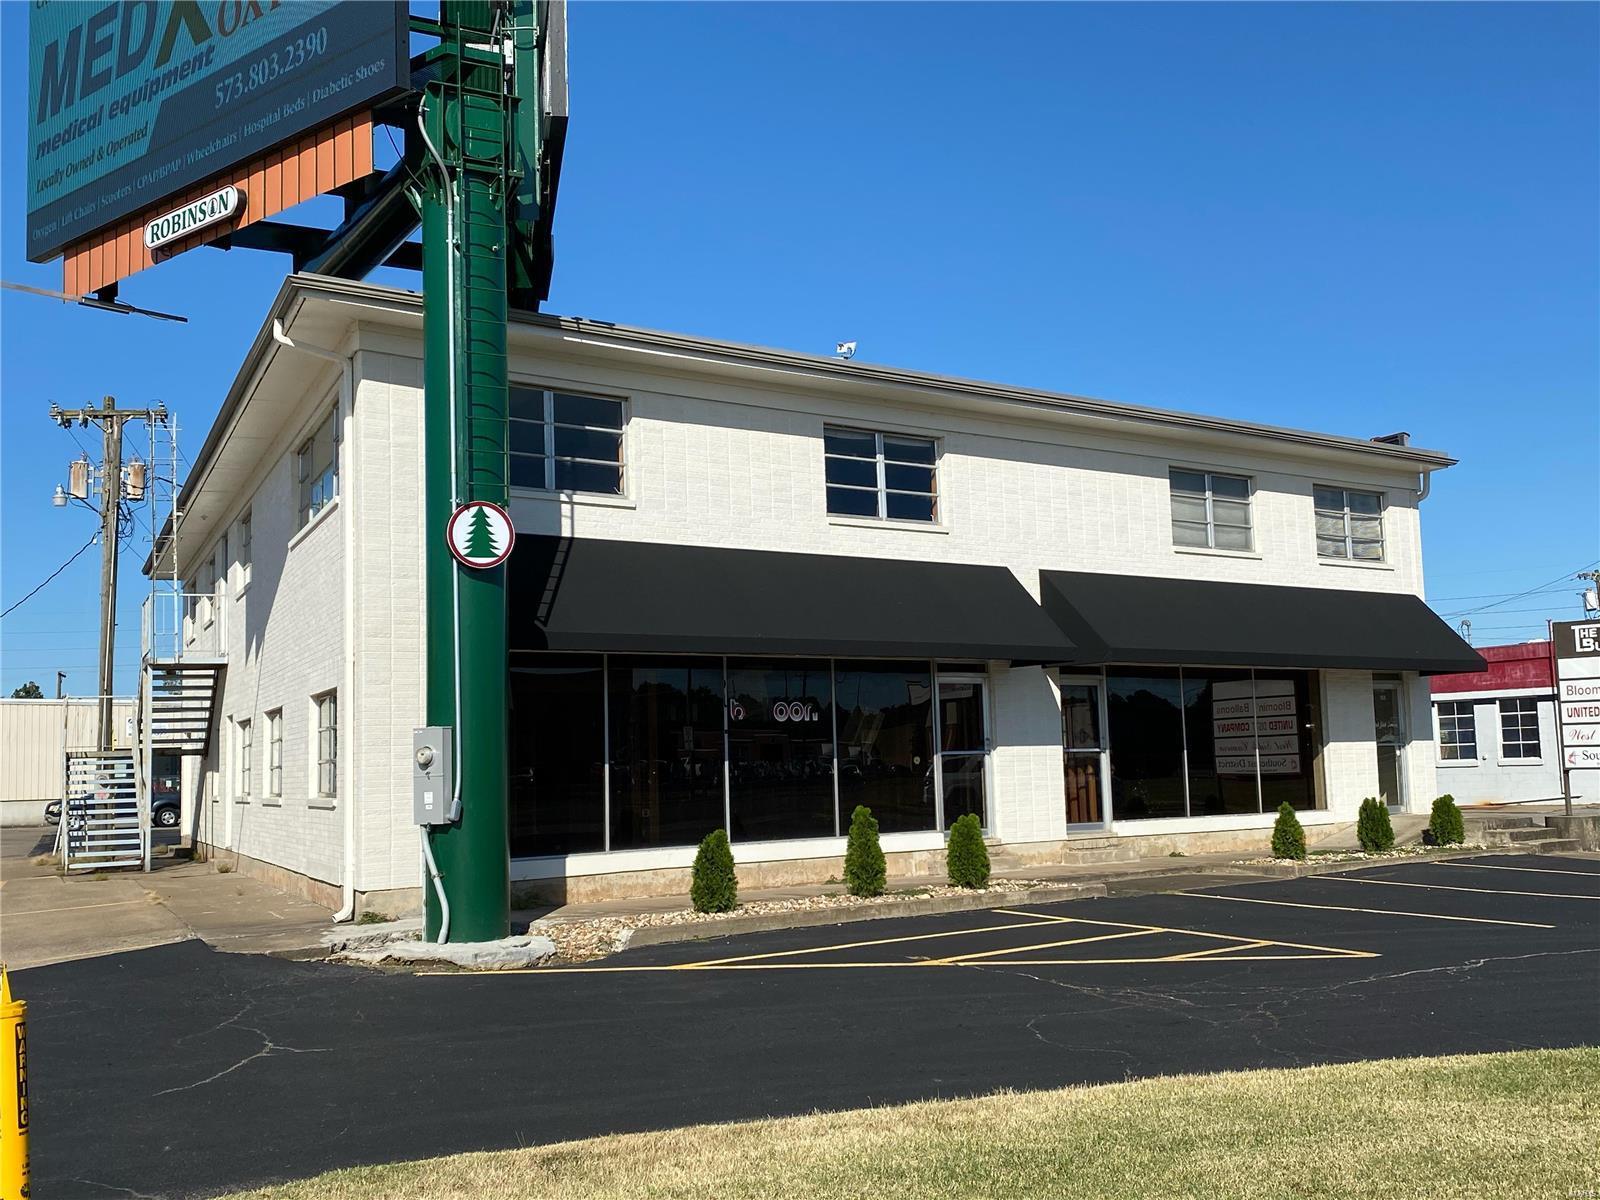 101 N Kingshighway Property Photo - Cape Girardeau, MO real estate listing